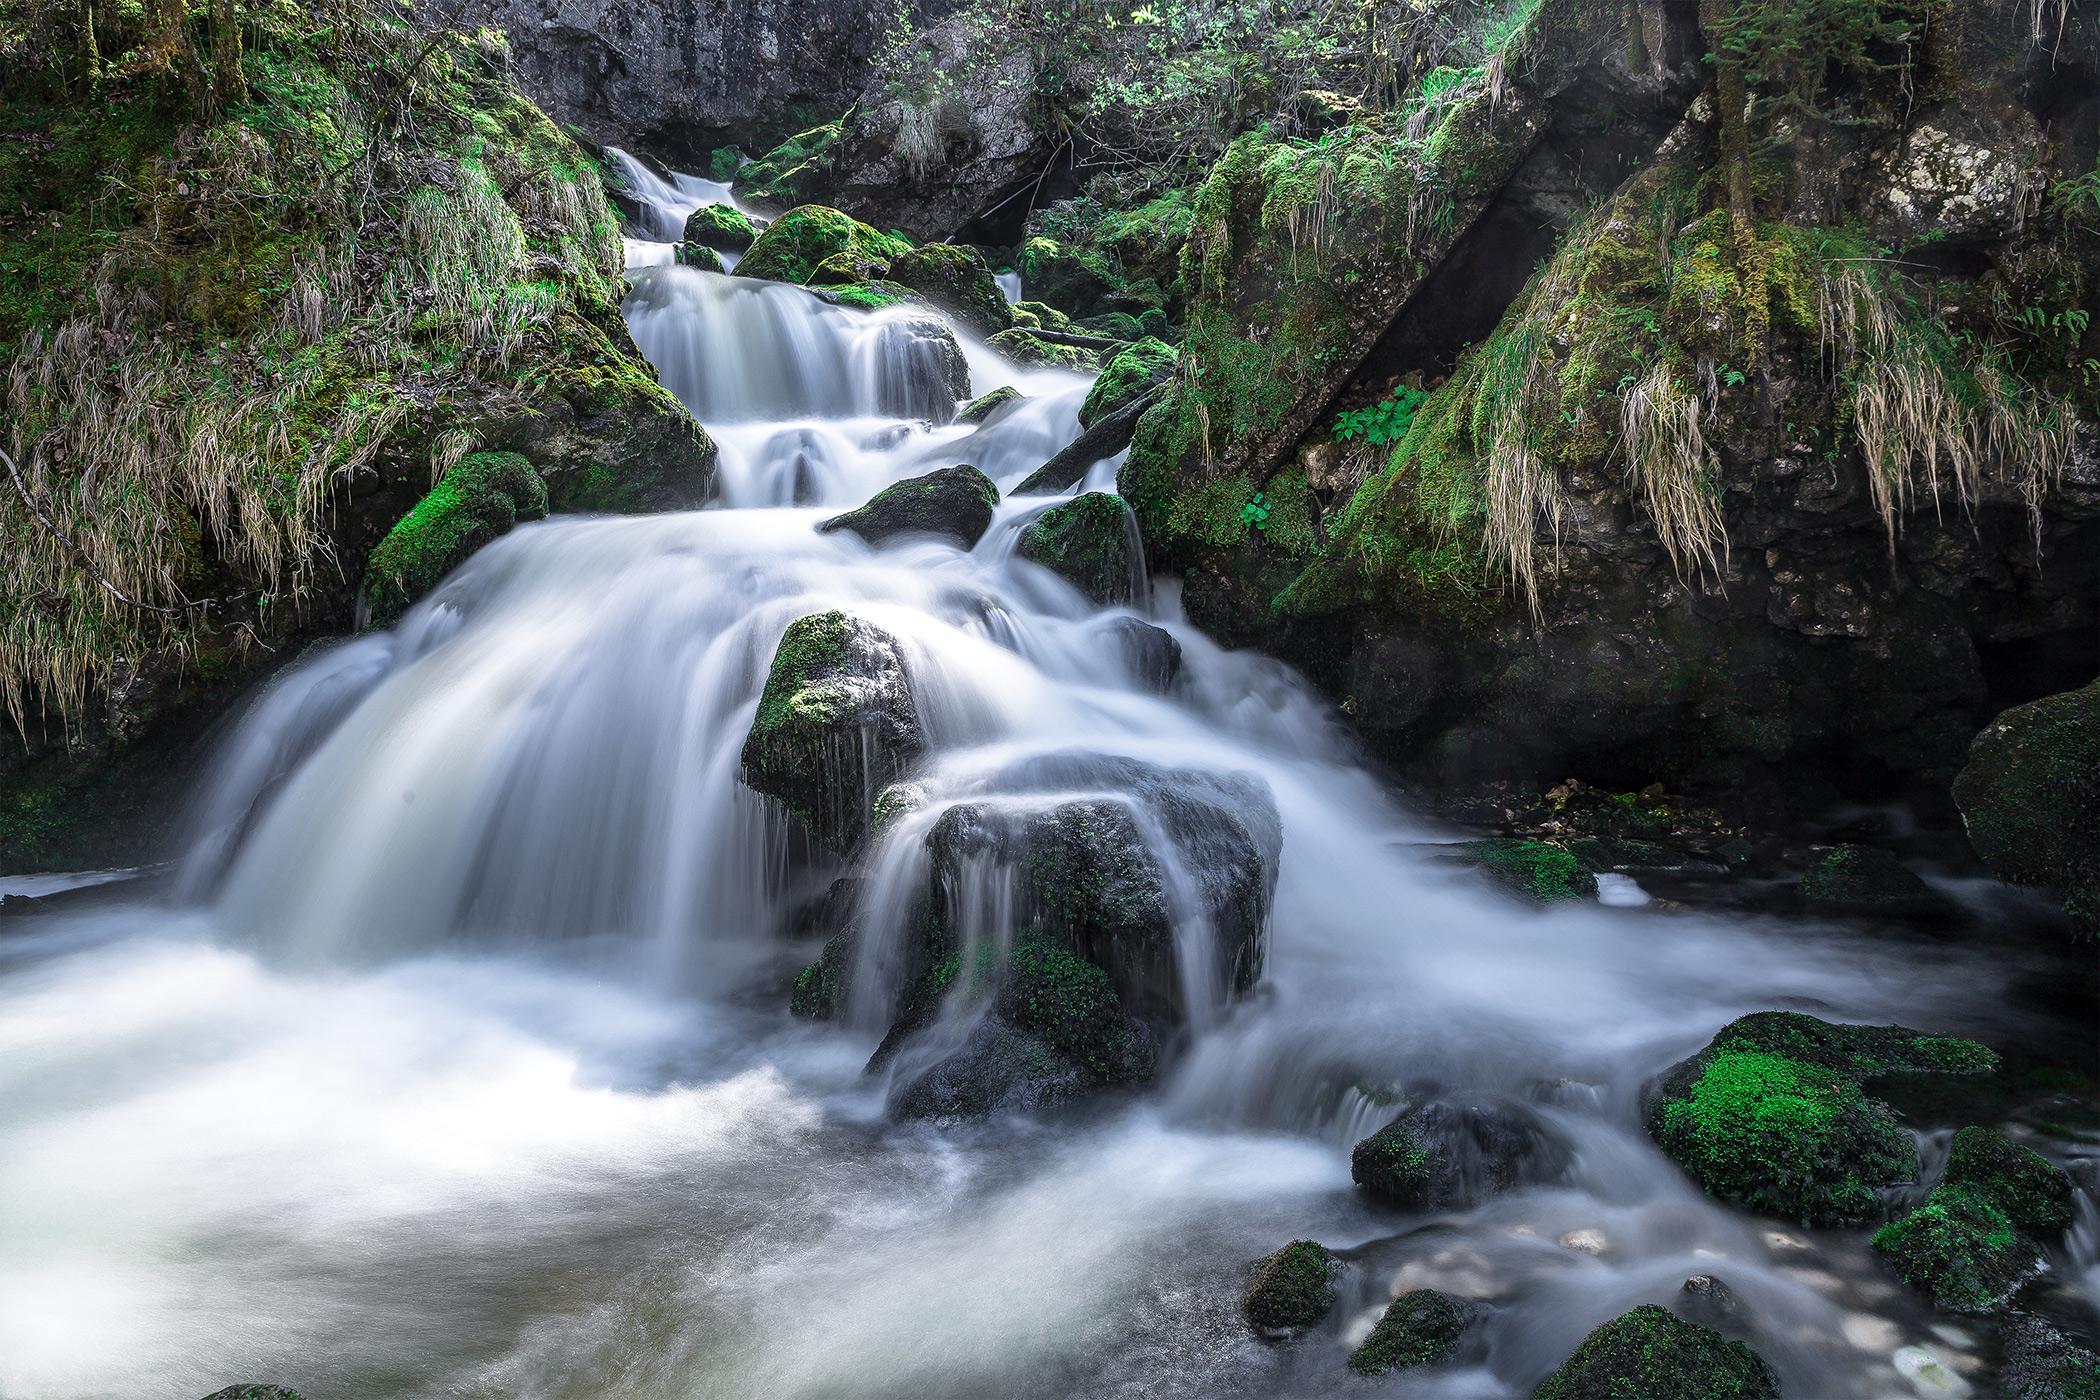 Wasserfall_Natur